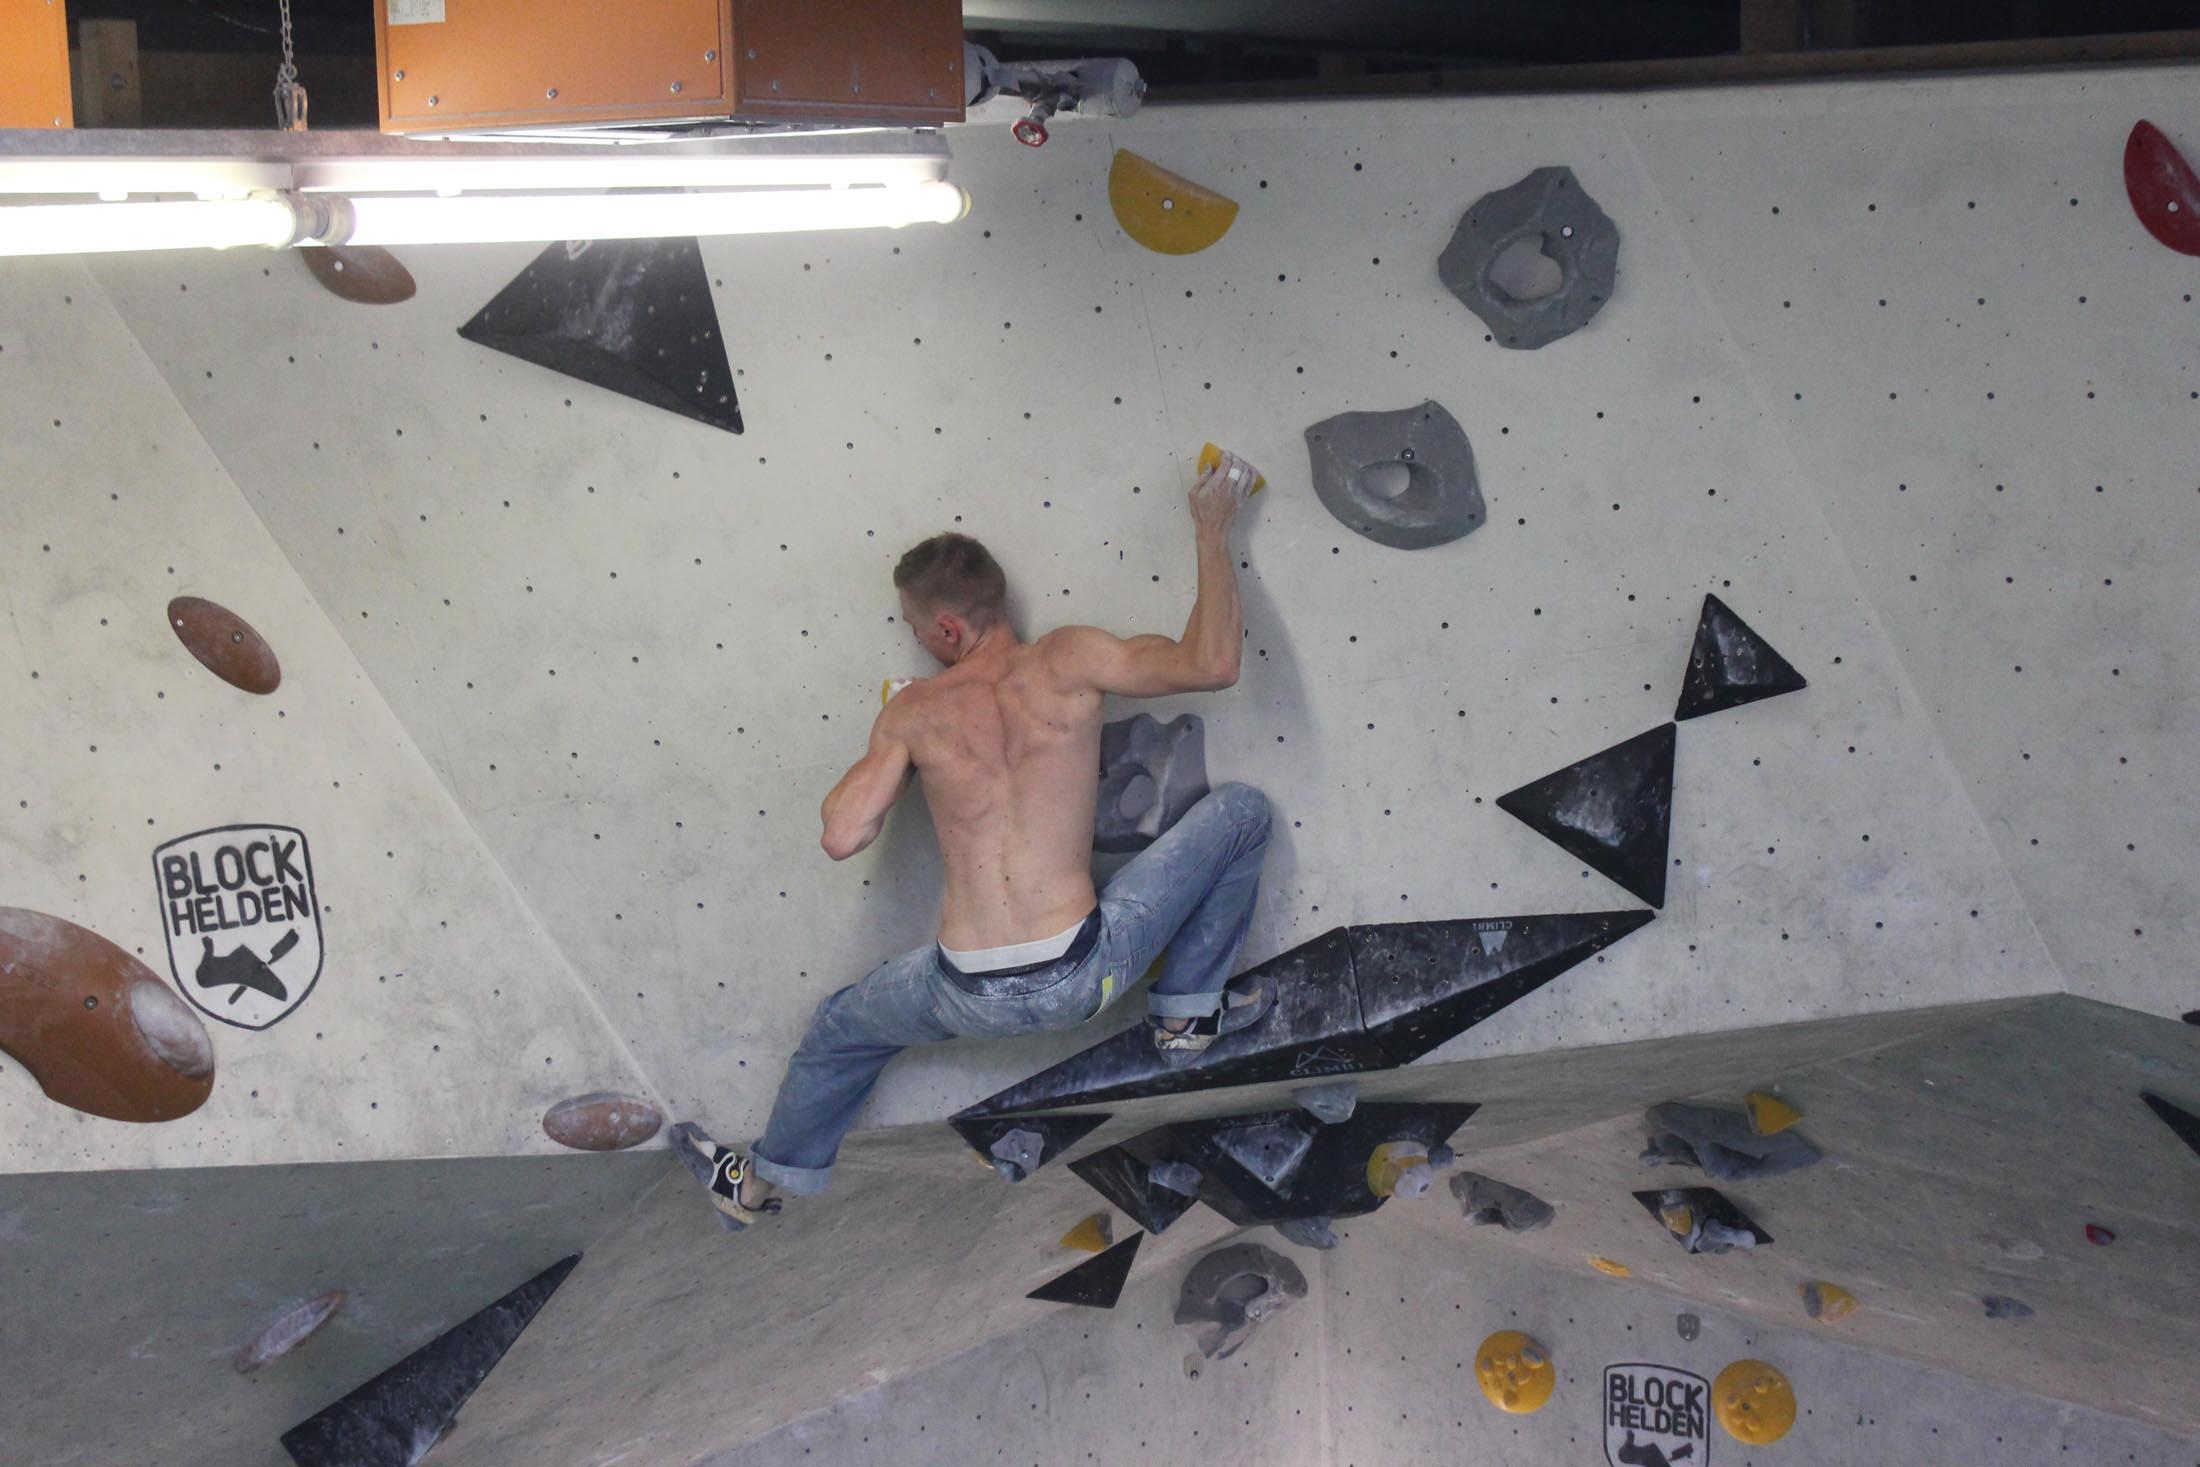 Quali, internationaler bouldercup Frankenjura 2016, BLOCKHELDEN Erlangen, Mammut, Bergfreunde.de, Boulderwettkampf07092016285